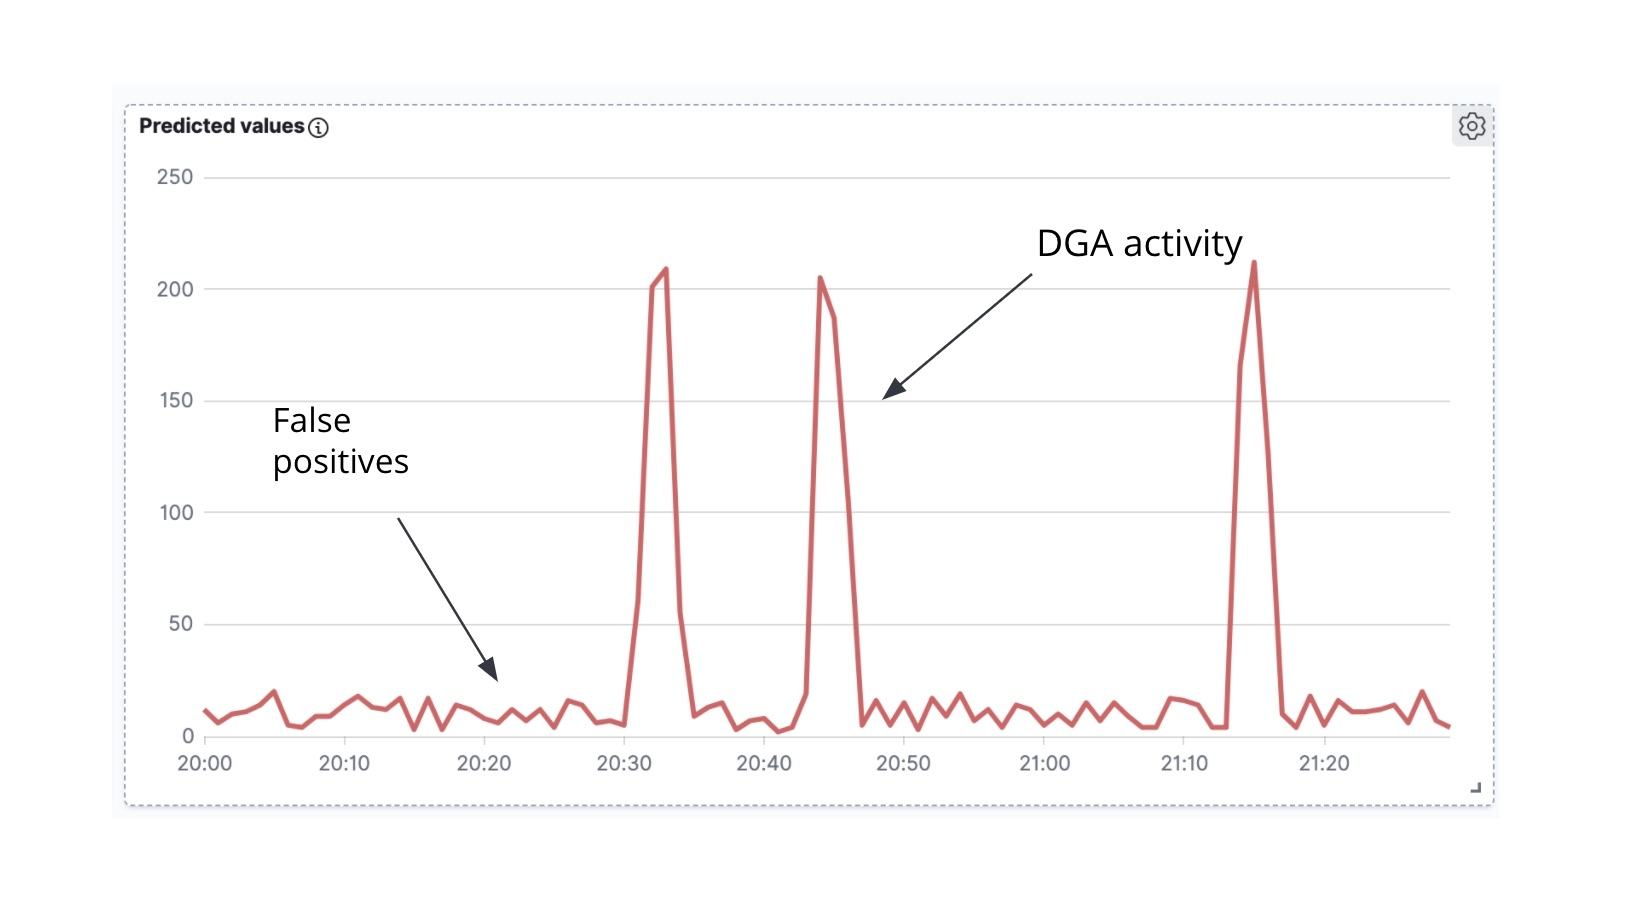 Atividade de DGA ao longo do tempo